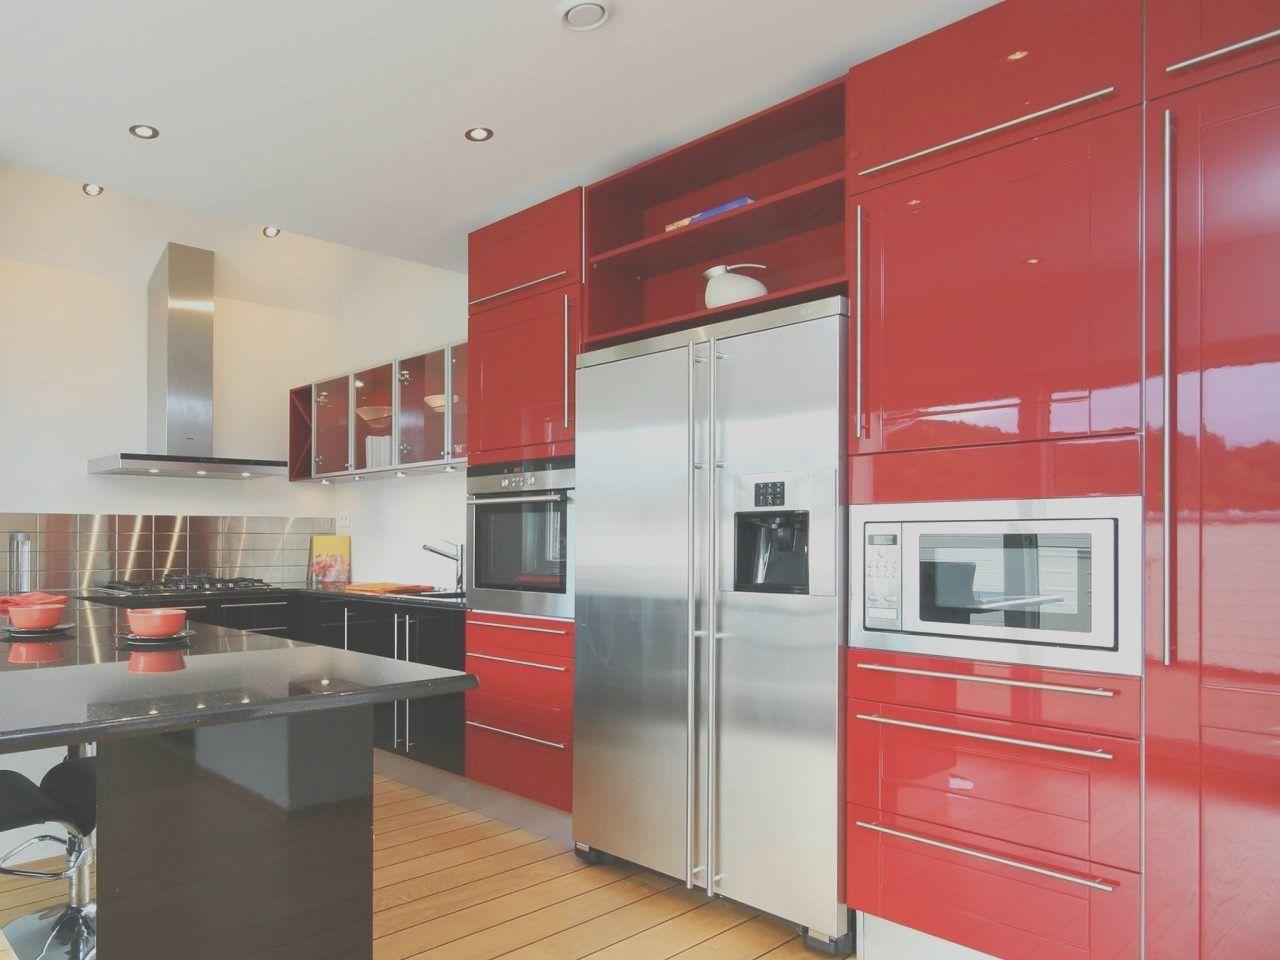 Modern Kitchen Cabinets Design For Modern Home Di 2020 Dapur Modern Desain Dapur Modern Dapur Kontemporer